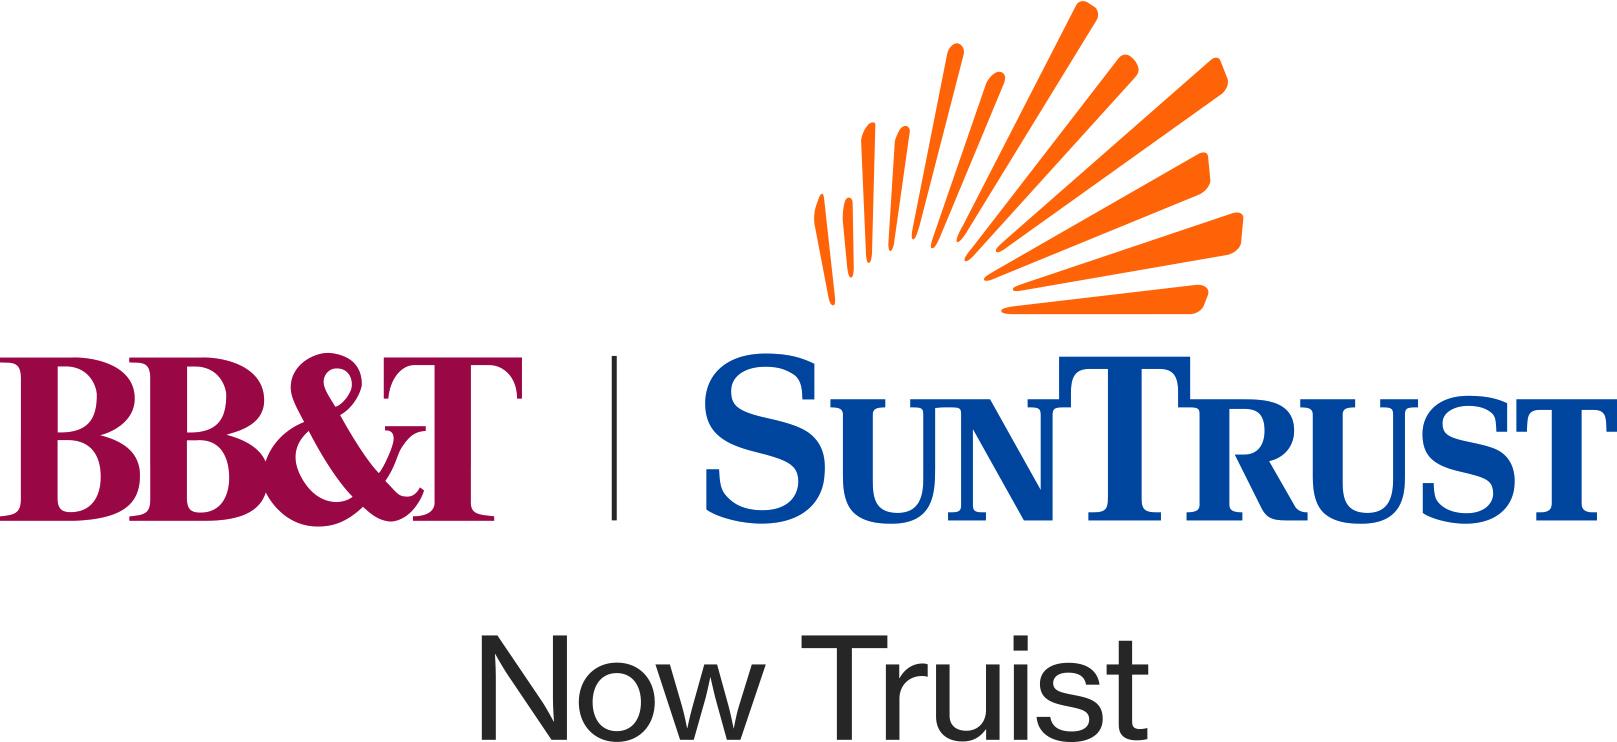 BB&T Sun Trust Now Truist